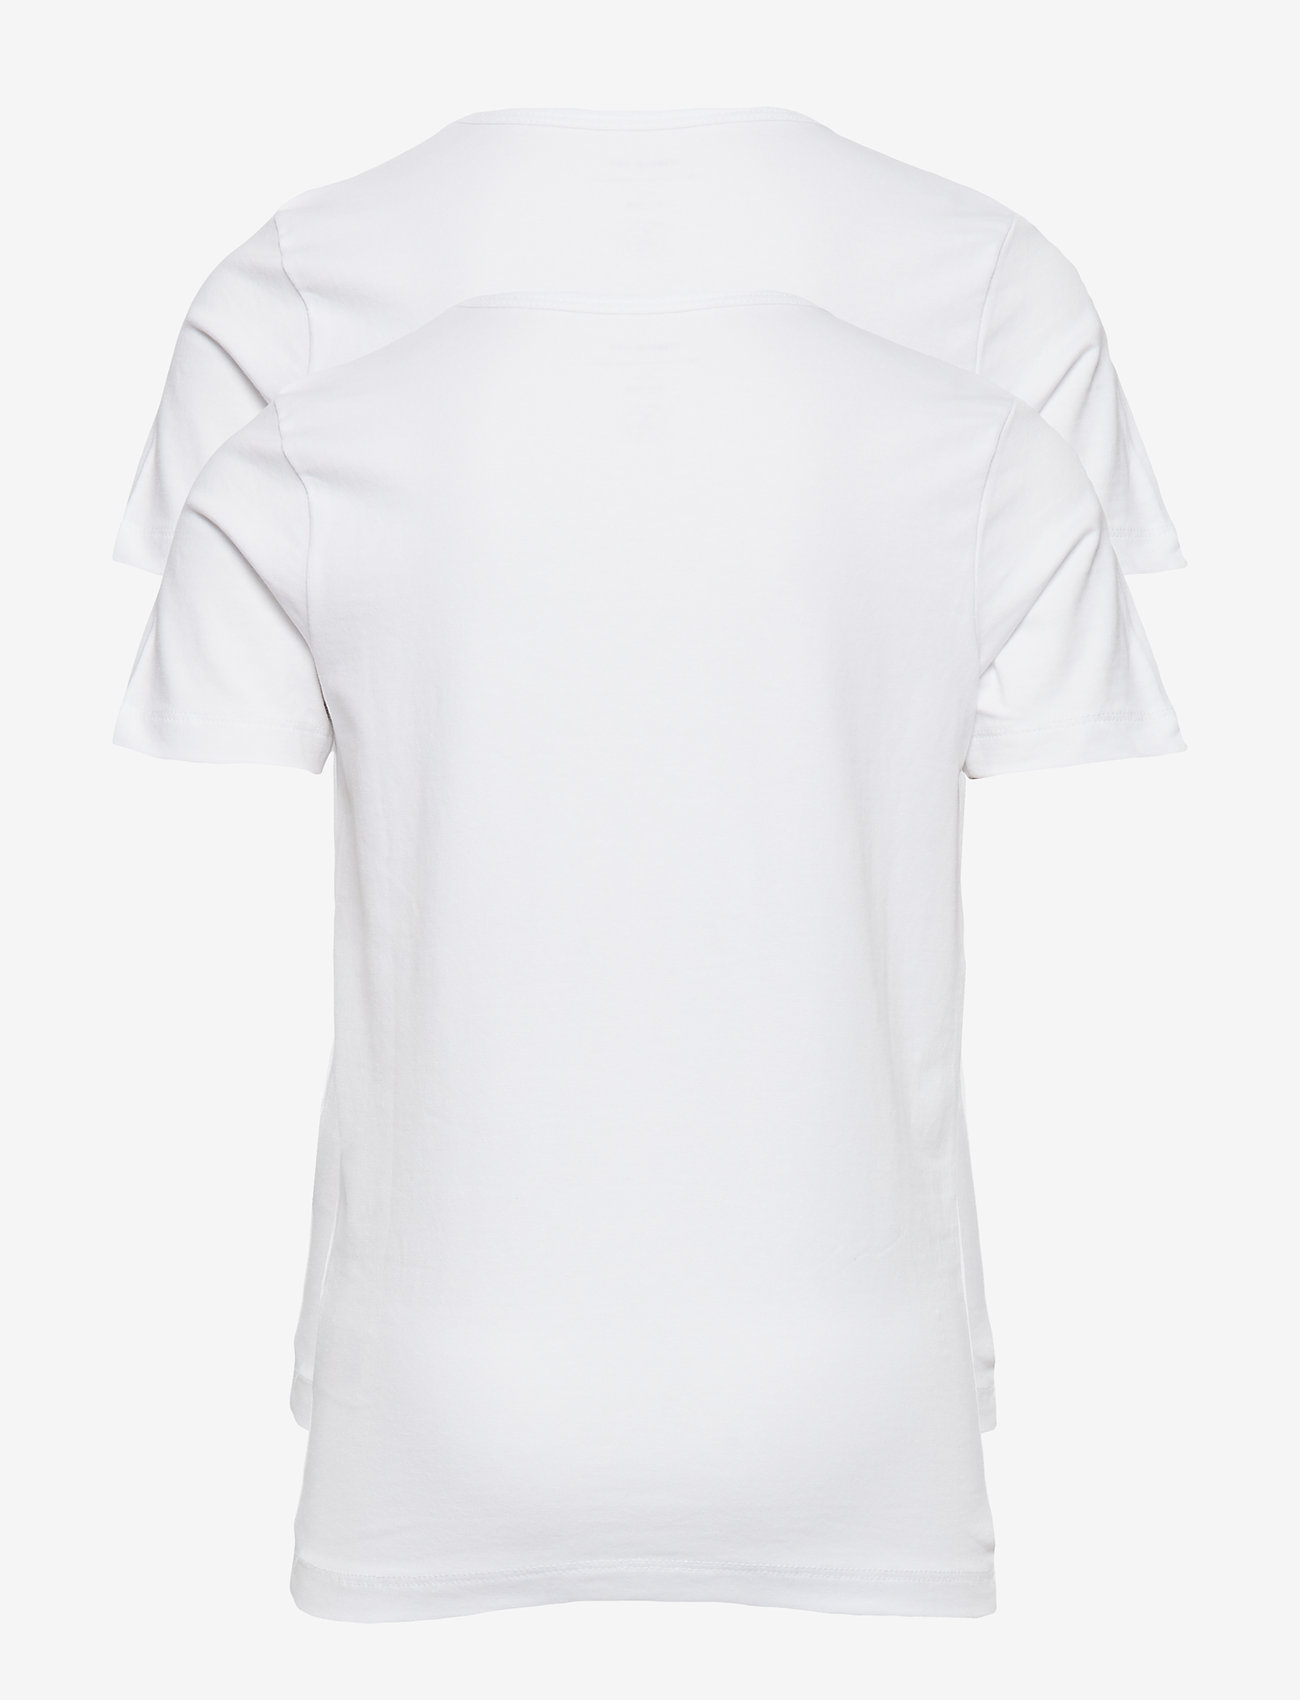 name it - NKMT-SHIRT SLIM 2P SOLID WHITE NOOS - kortærmede - bright white - 1